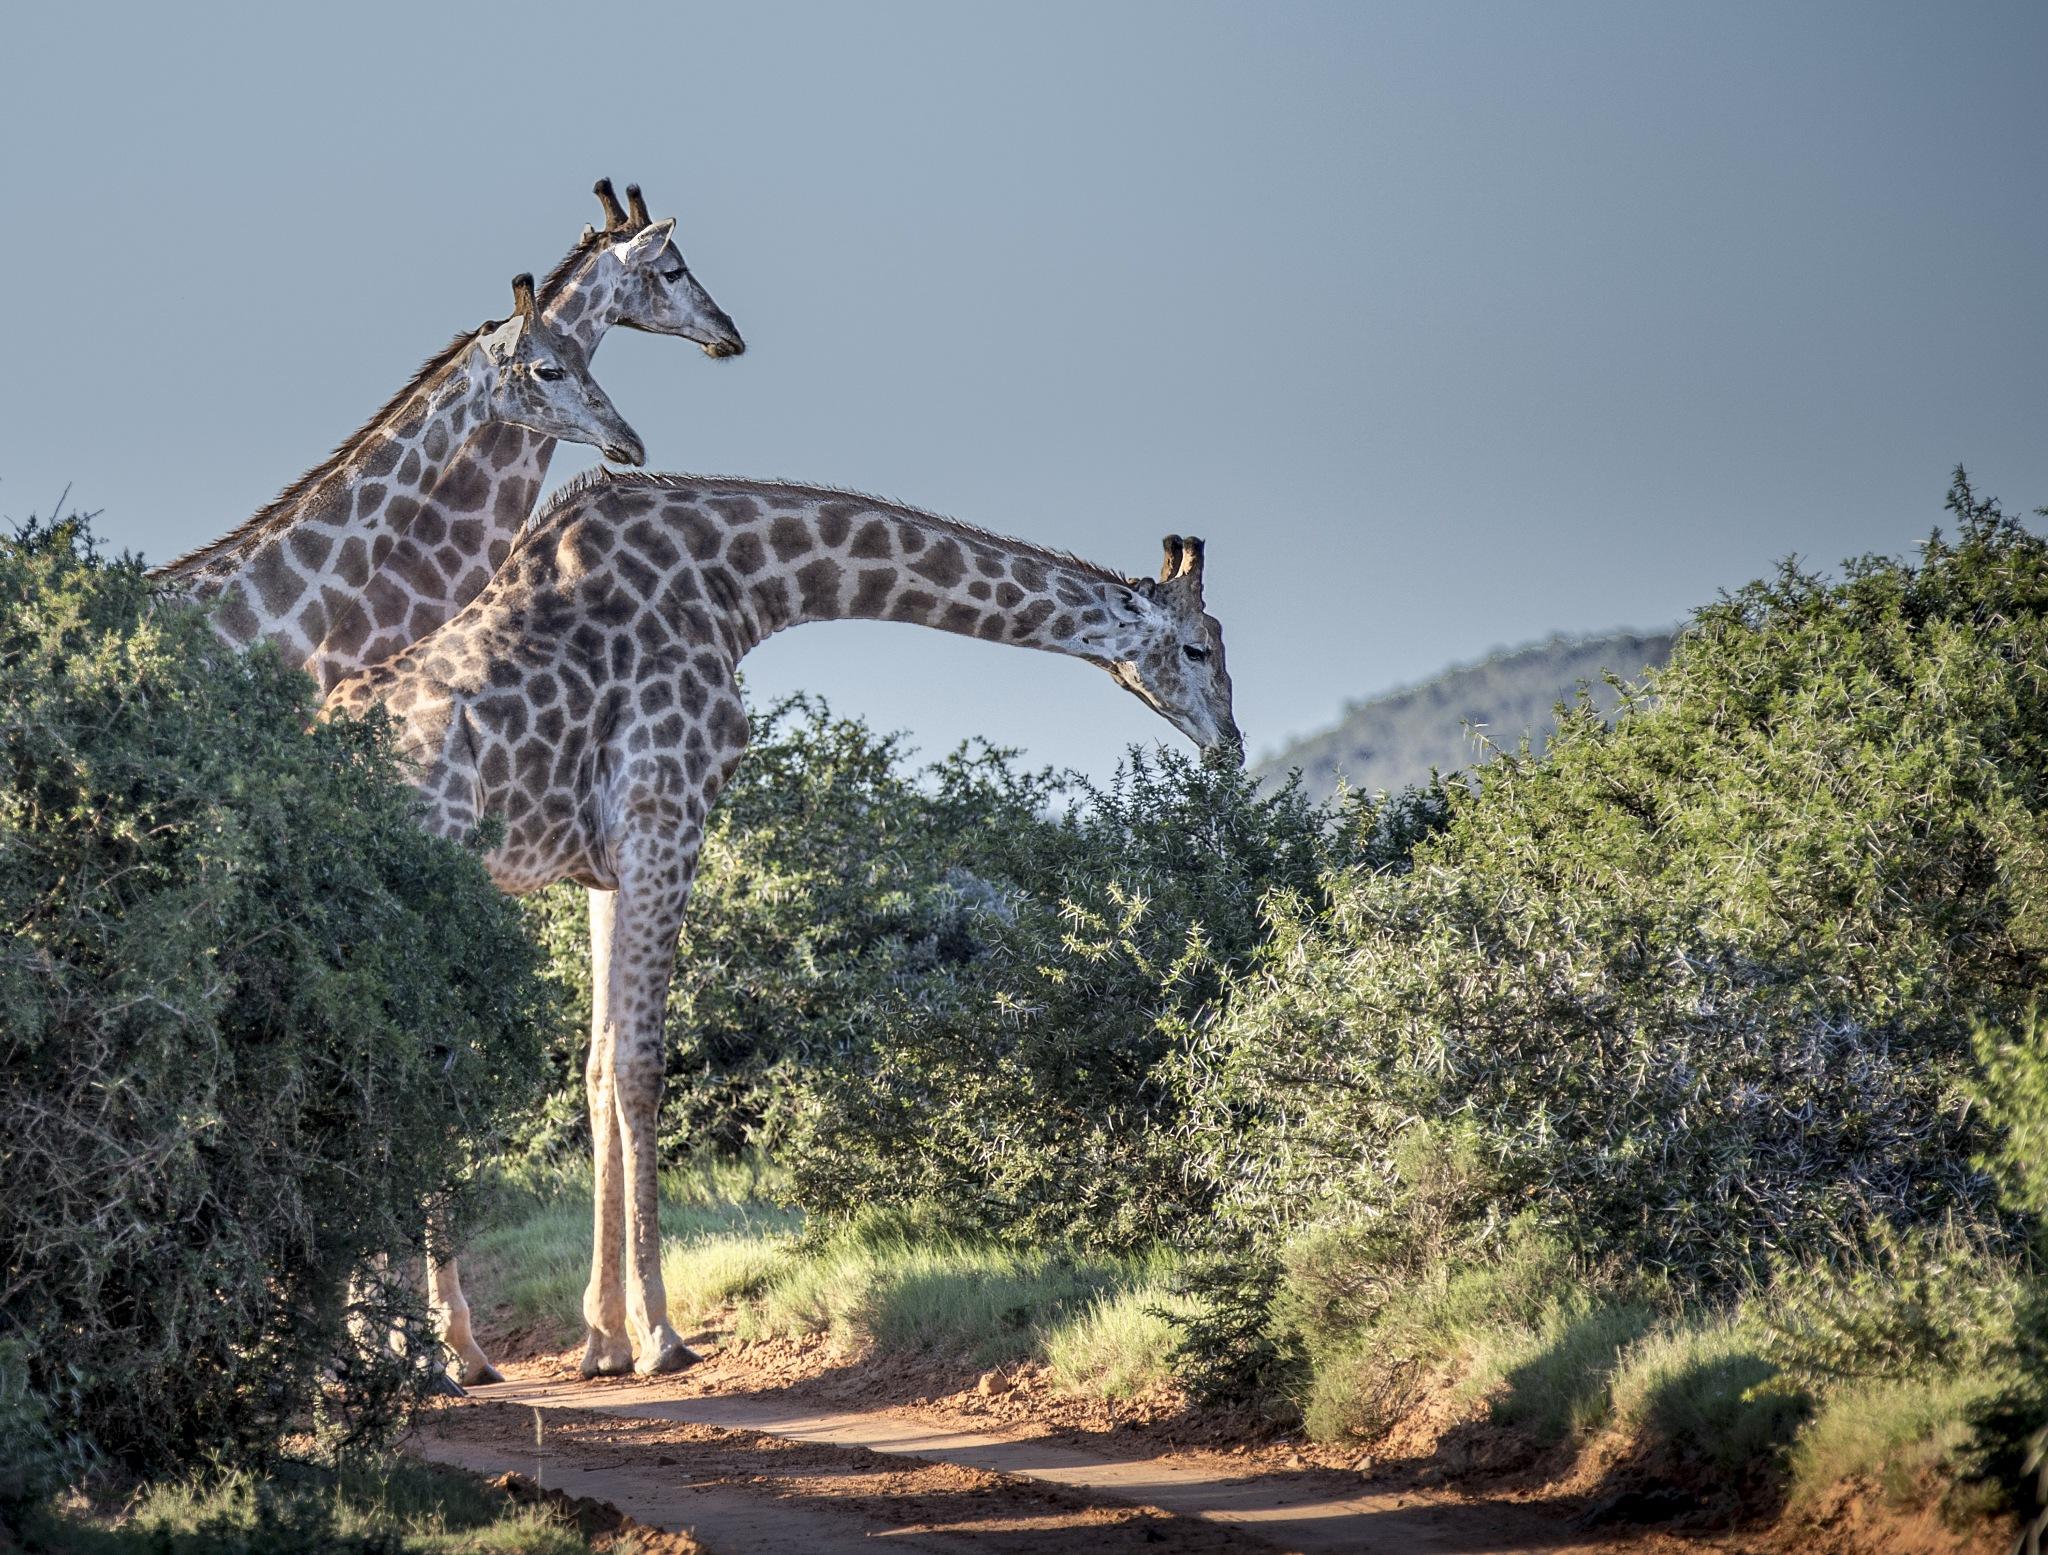 Safari Rush Hour by sdixon2380